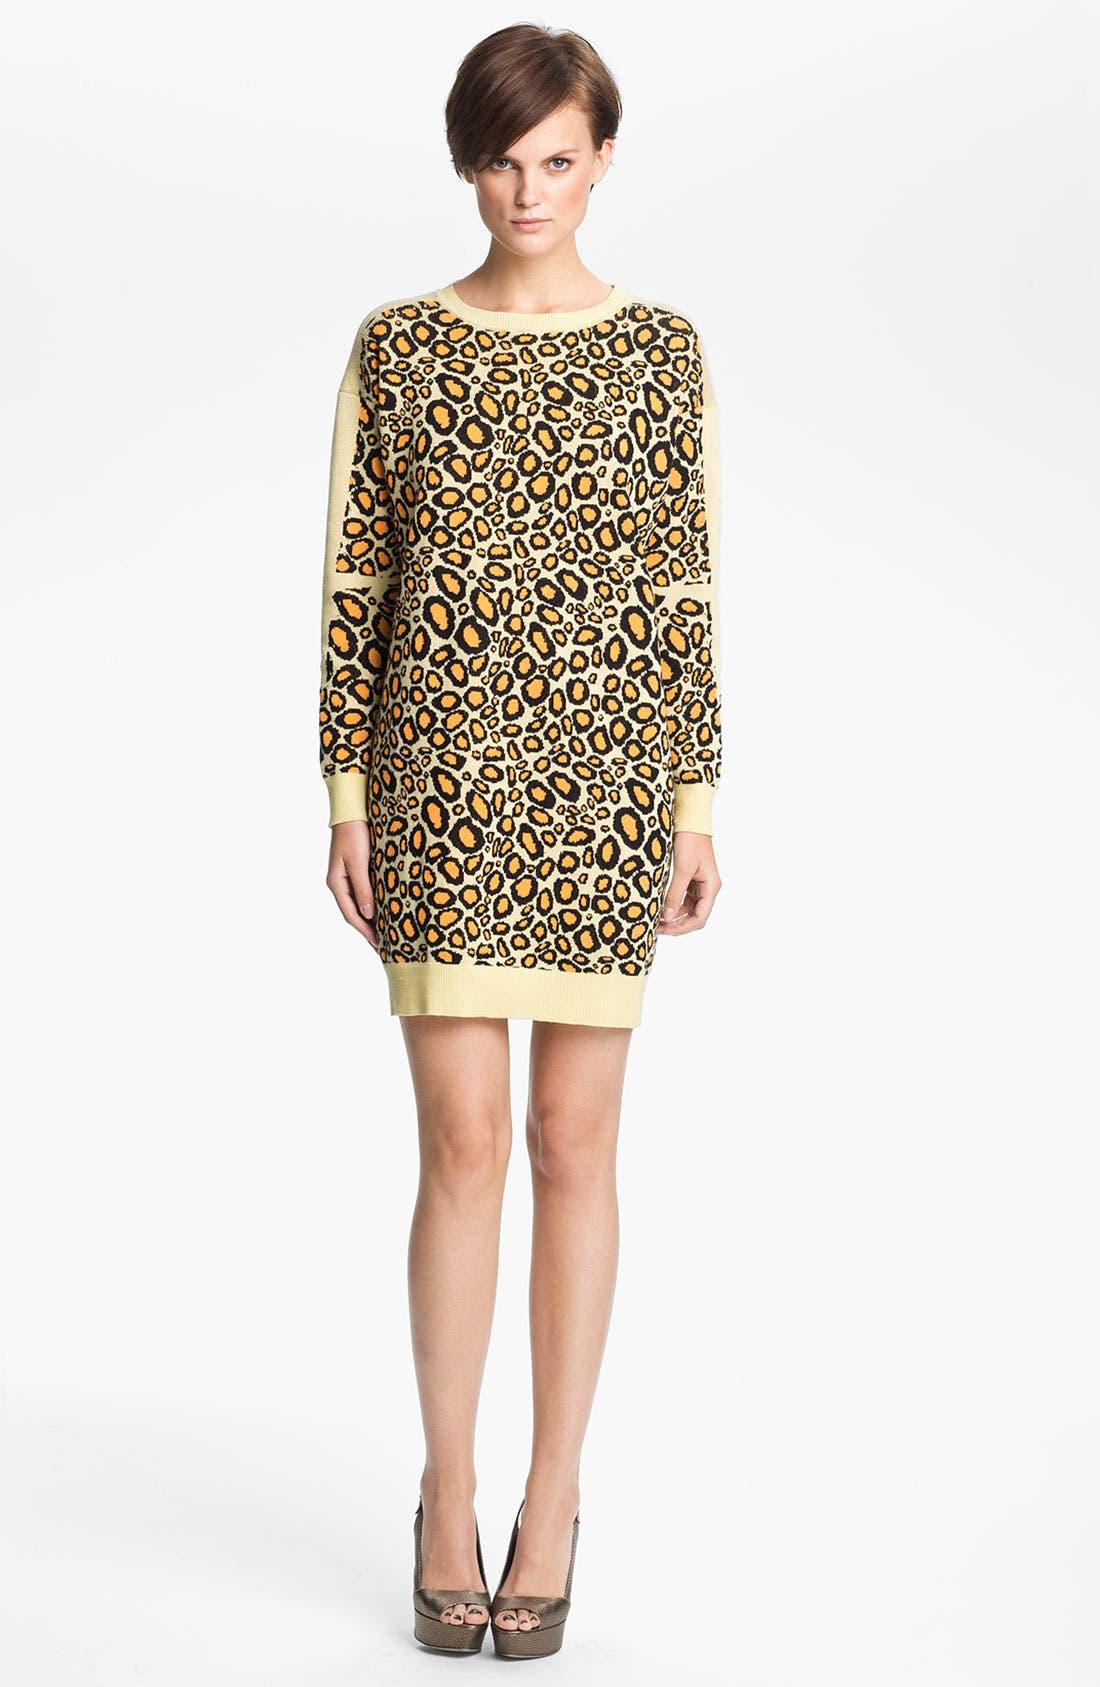 Main Image - KENZO Leopard Jacquard Sweater Dress